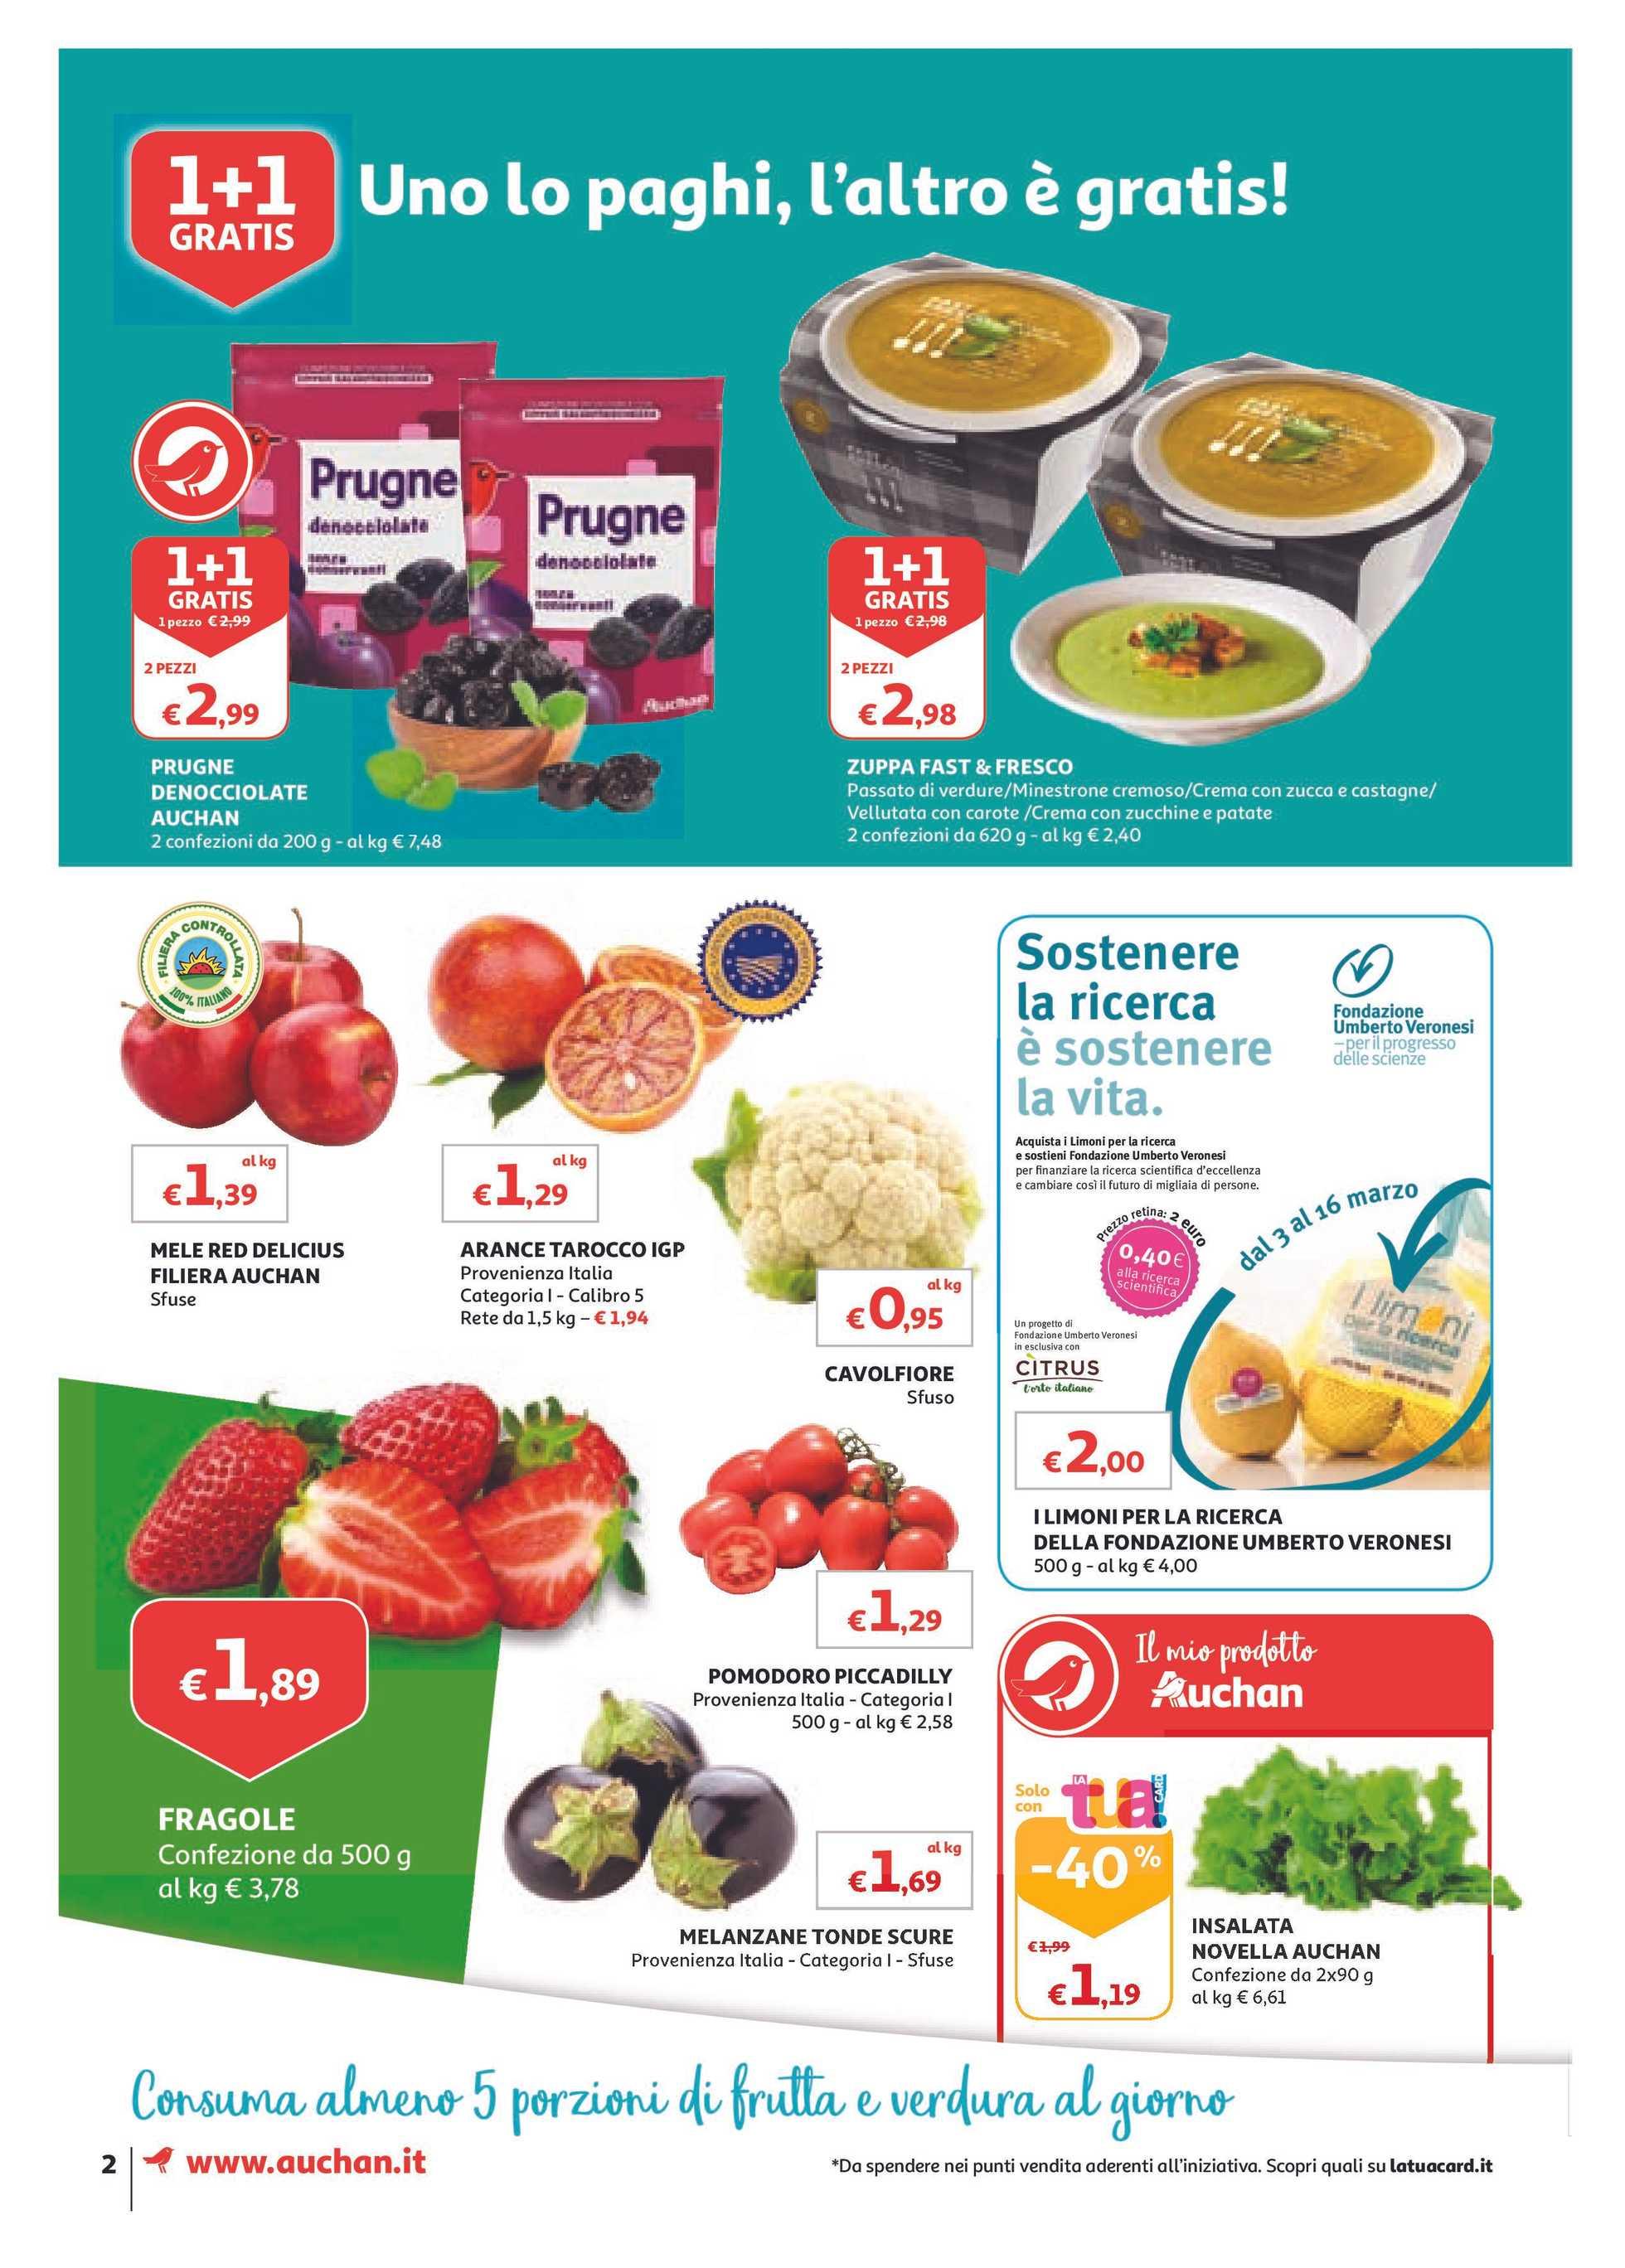 Auchan - offerte valide dal 01.03.2019 al 10.03.2019 - pagina 2.